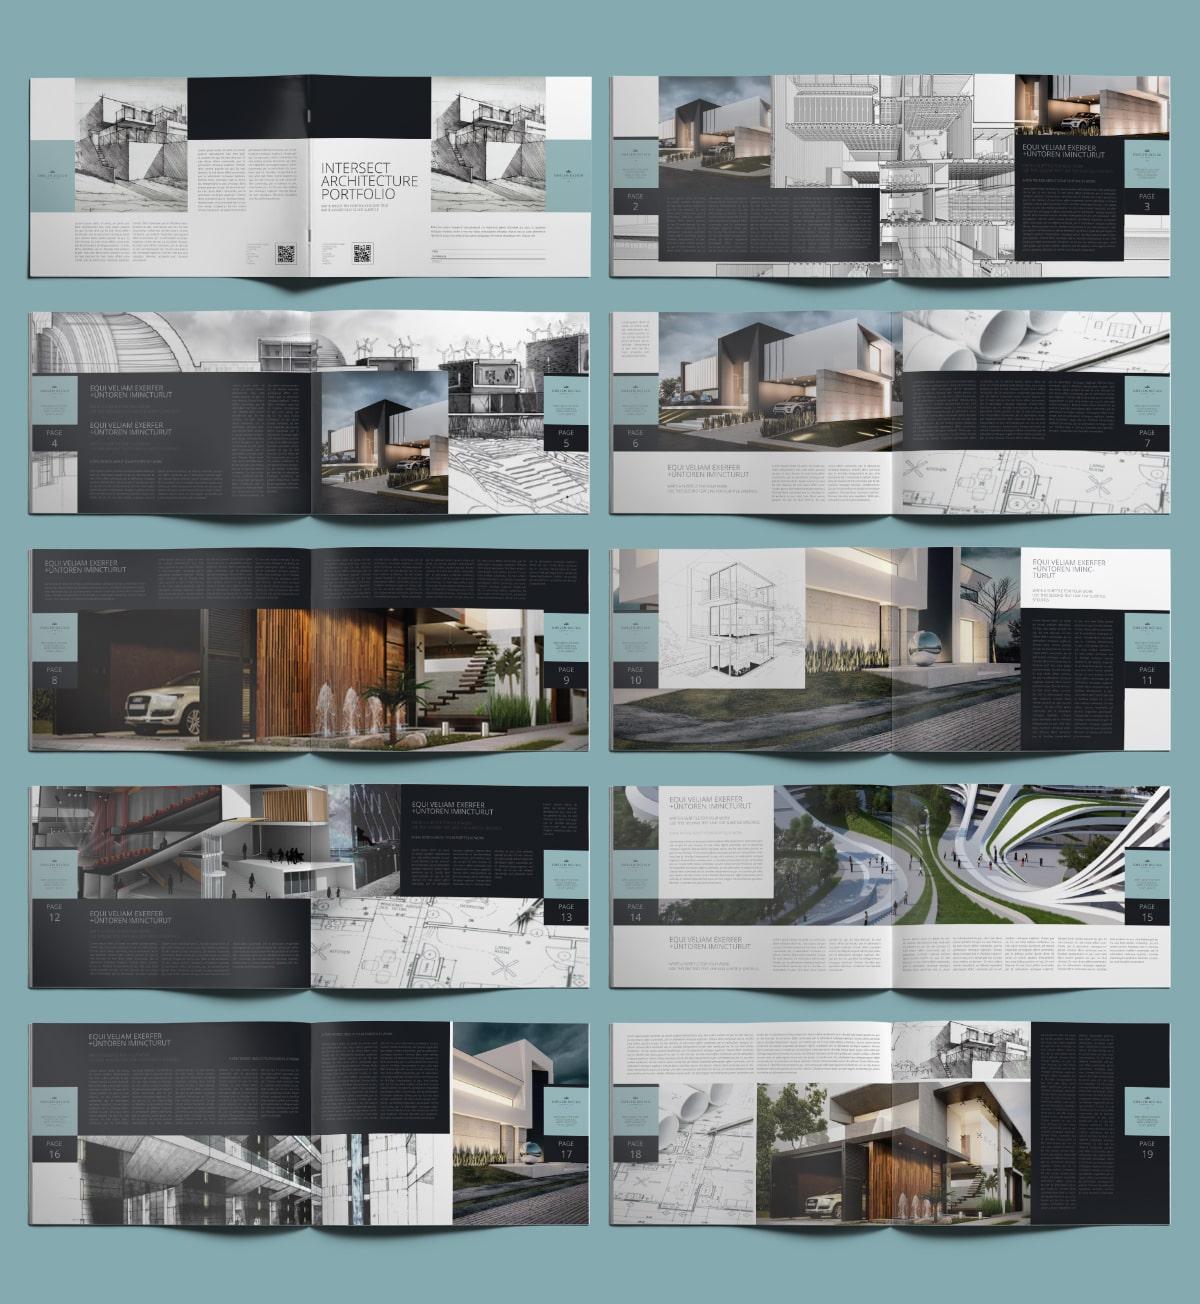 Intersect Architecture Portfolio A4 Landscape - Layouts